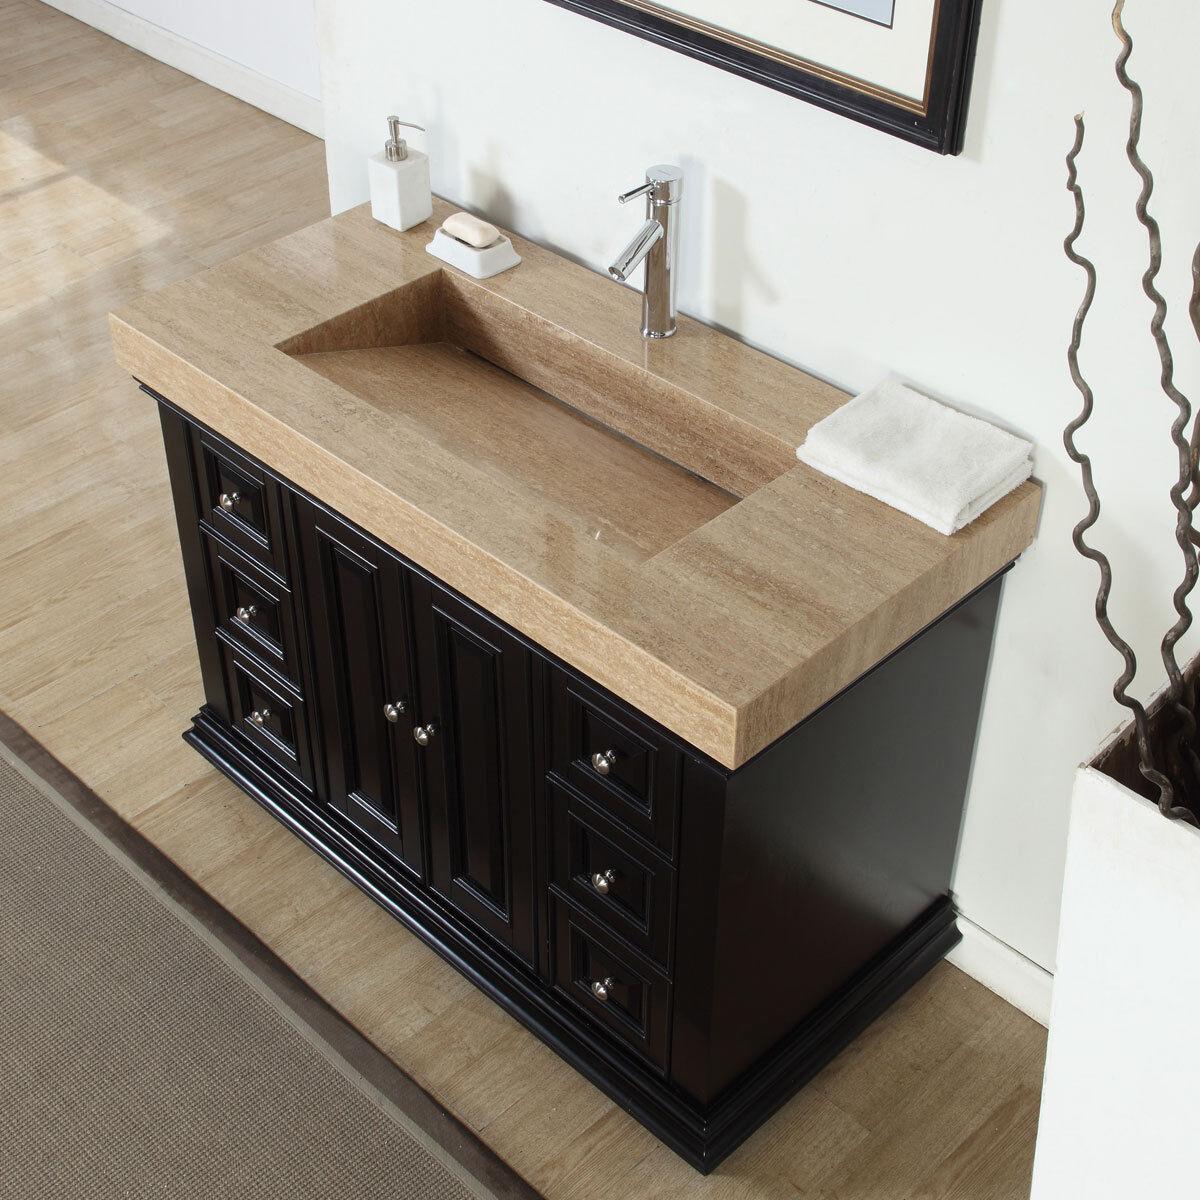 48 Inch Modern Bathroom Single Vanity Cabinet Travertine Top Ramp Sink 0284t For Sale Online Ebay